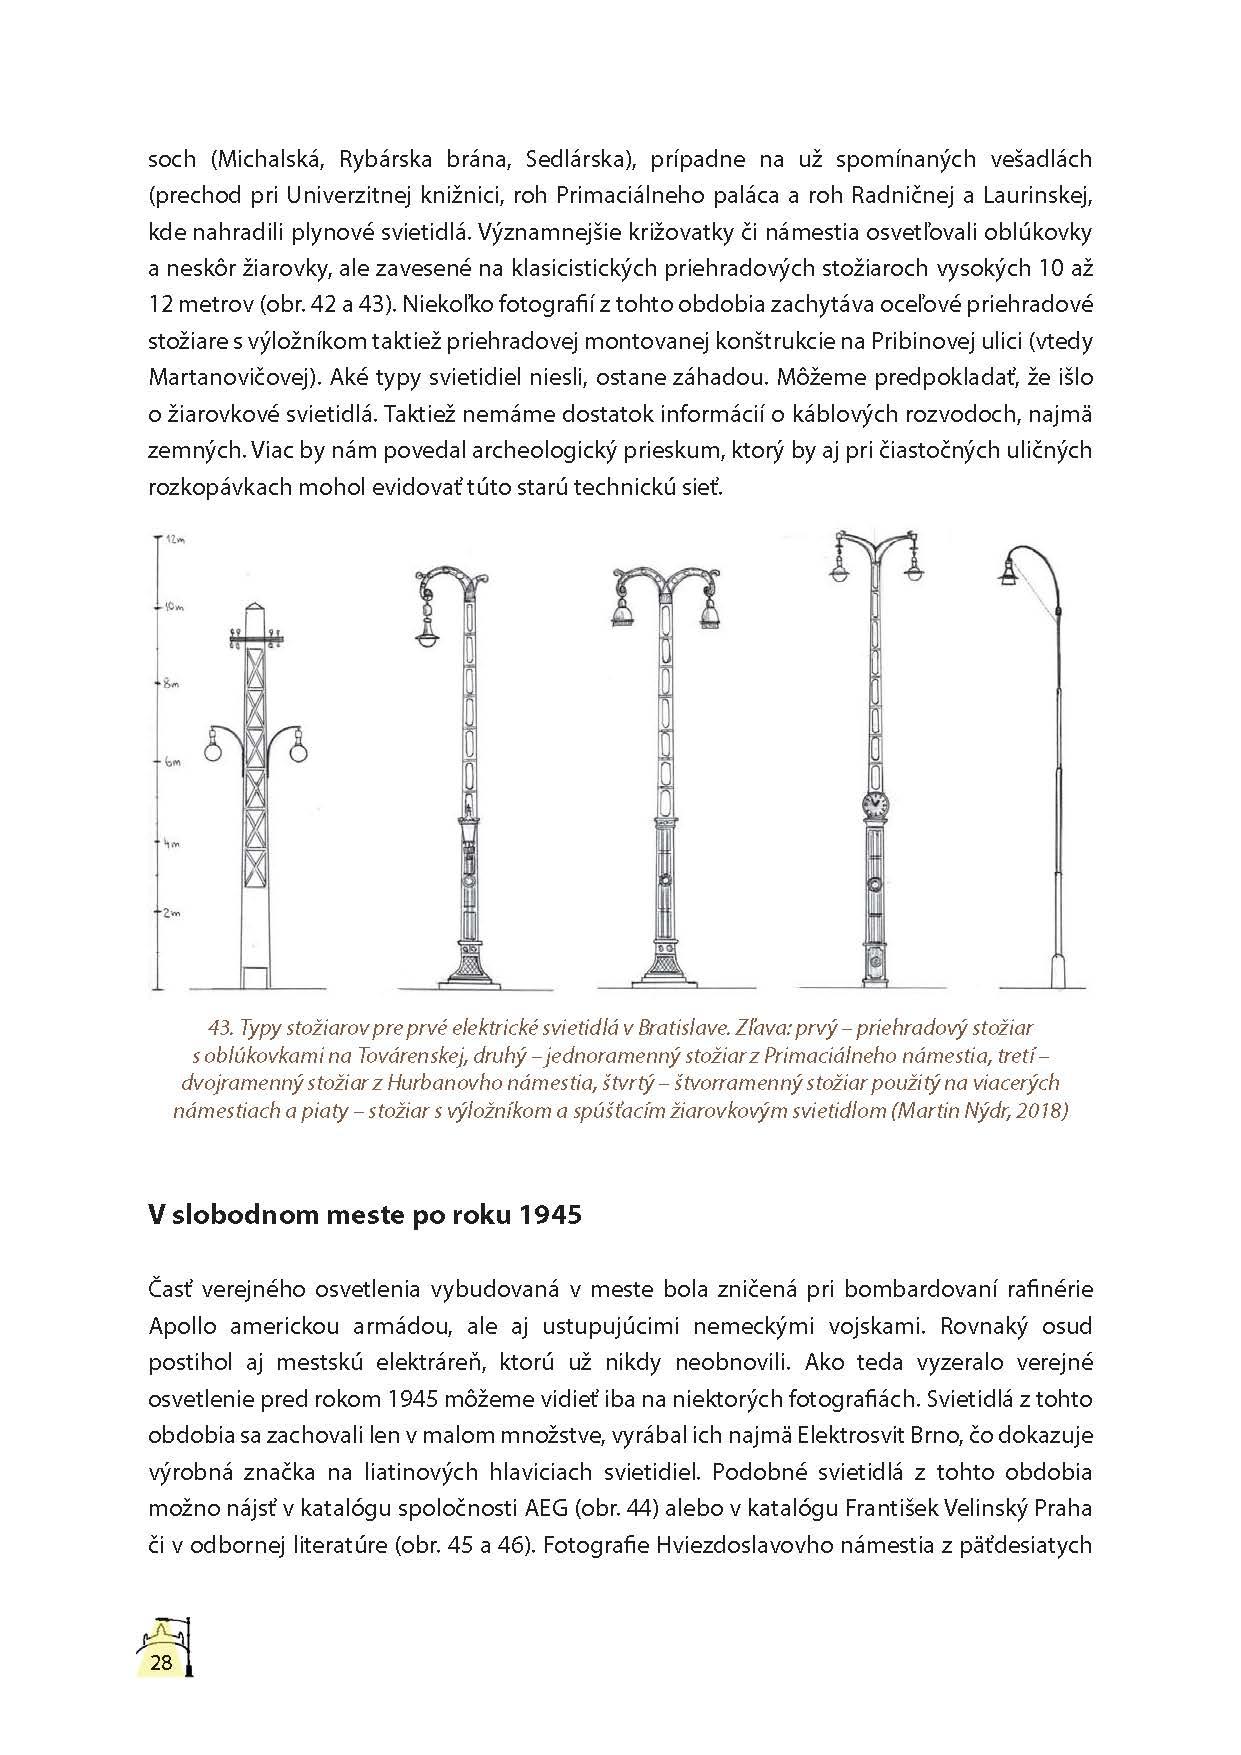 Lampy verejného osvetlenia v Bratislave 4